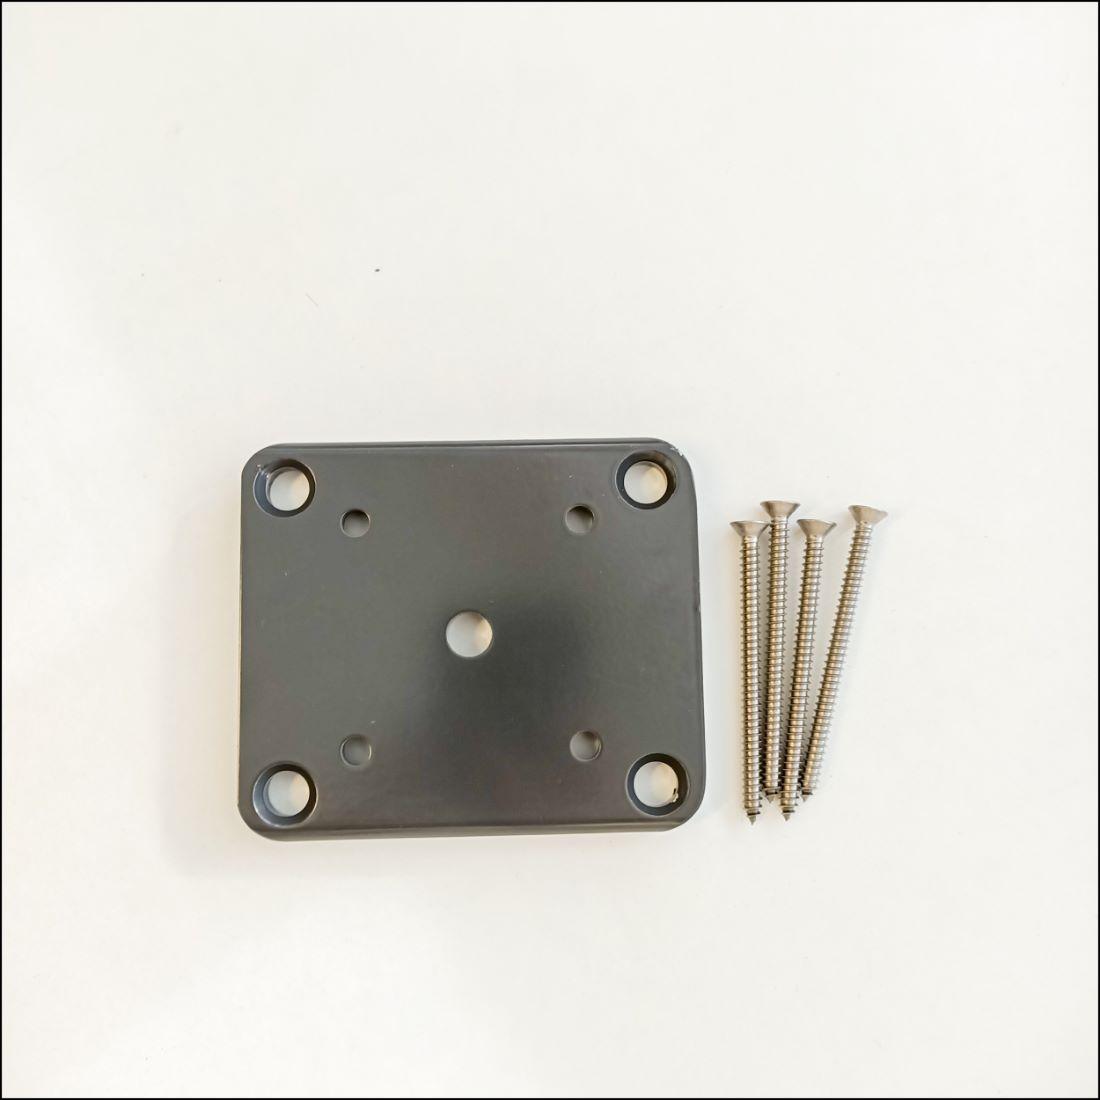 65 x 65mm Base Plate Set Grey